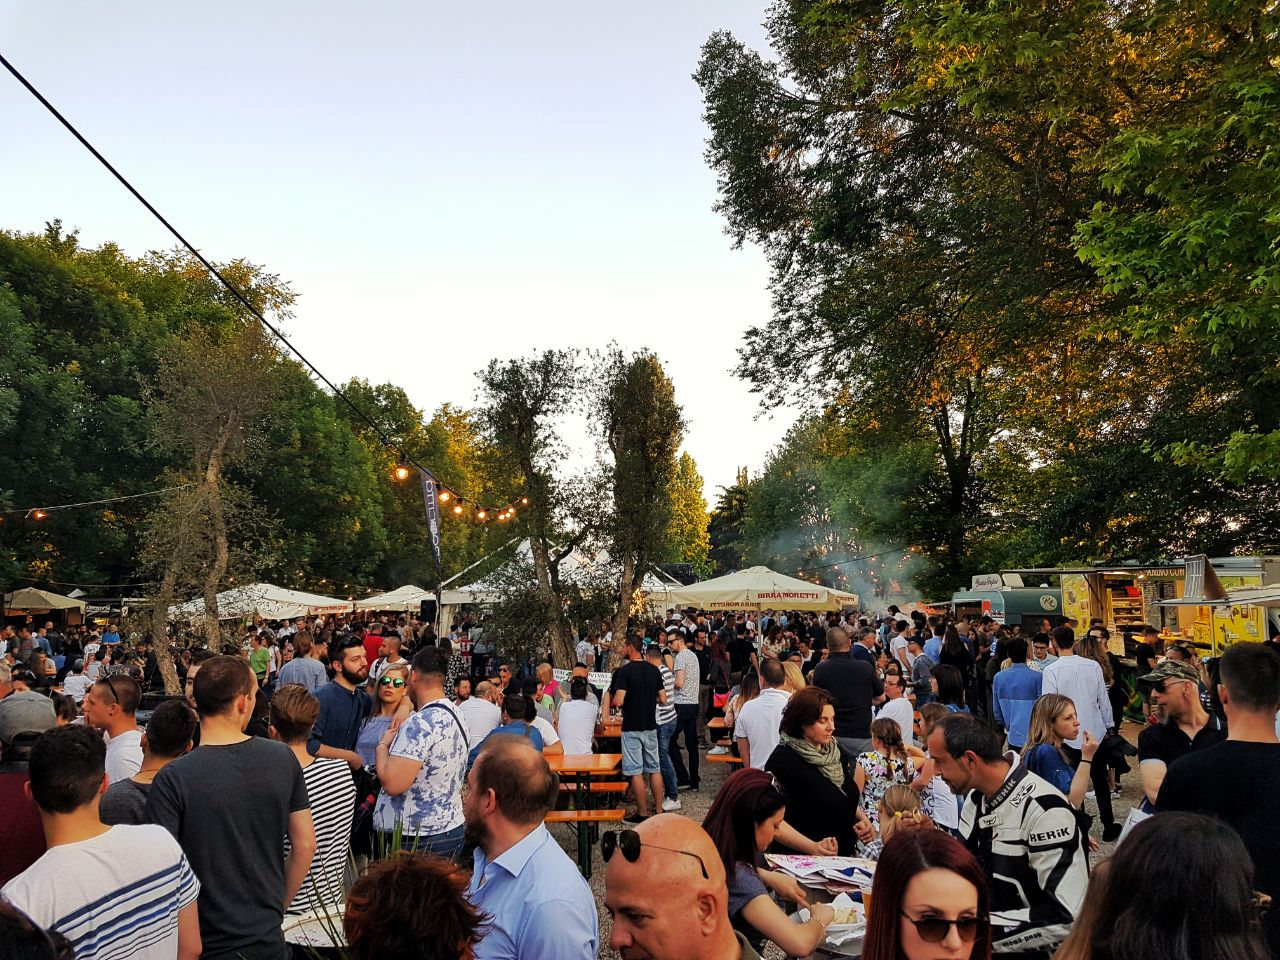 Mangia street food festival con food truck e tanta gente